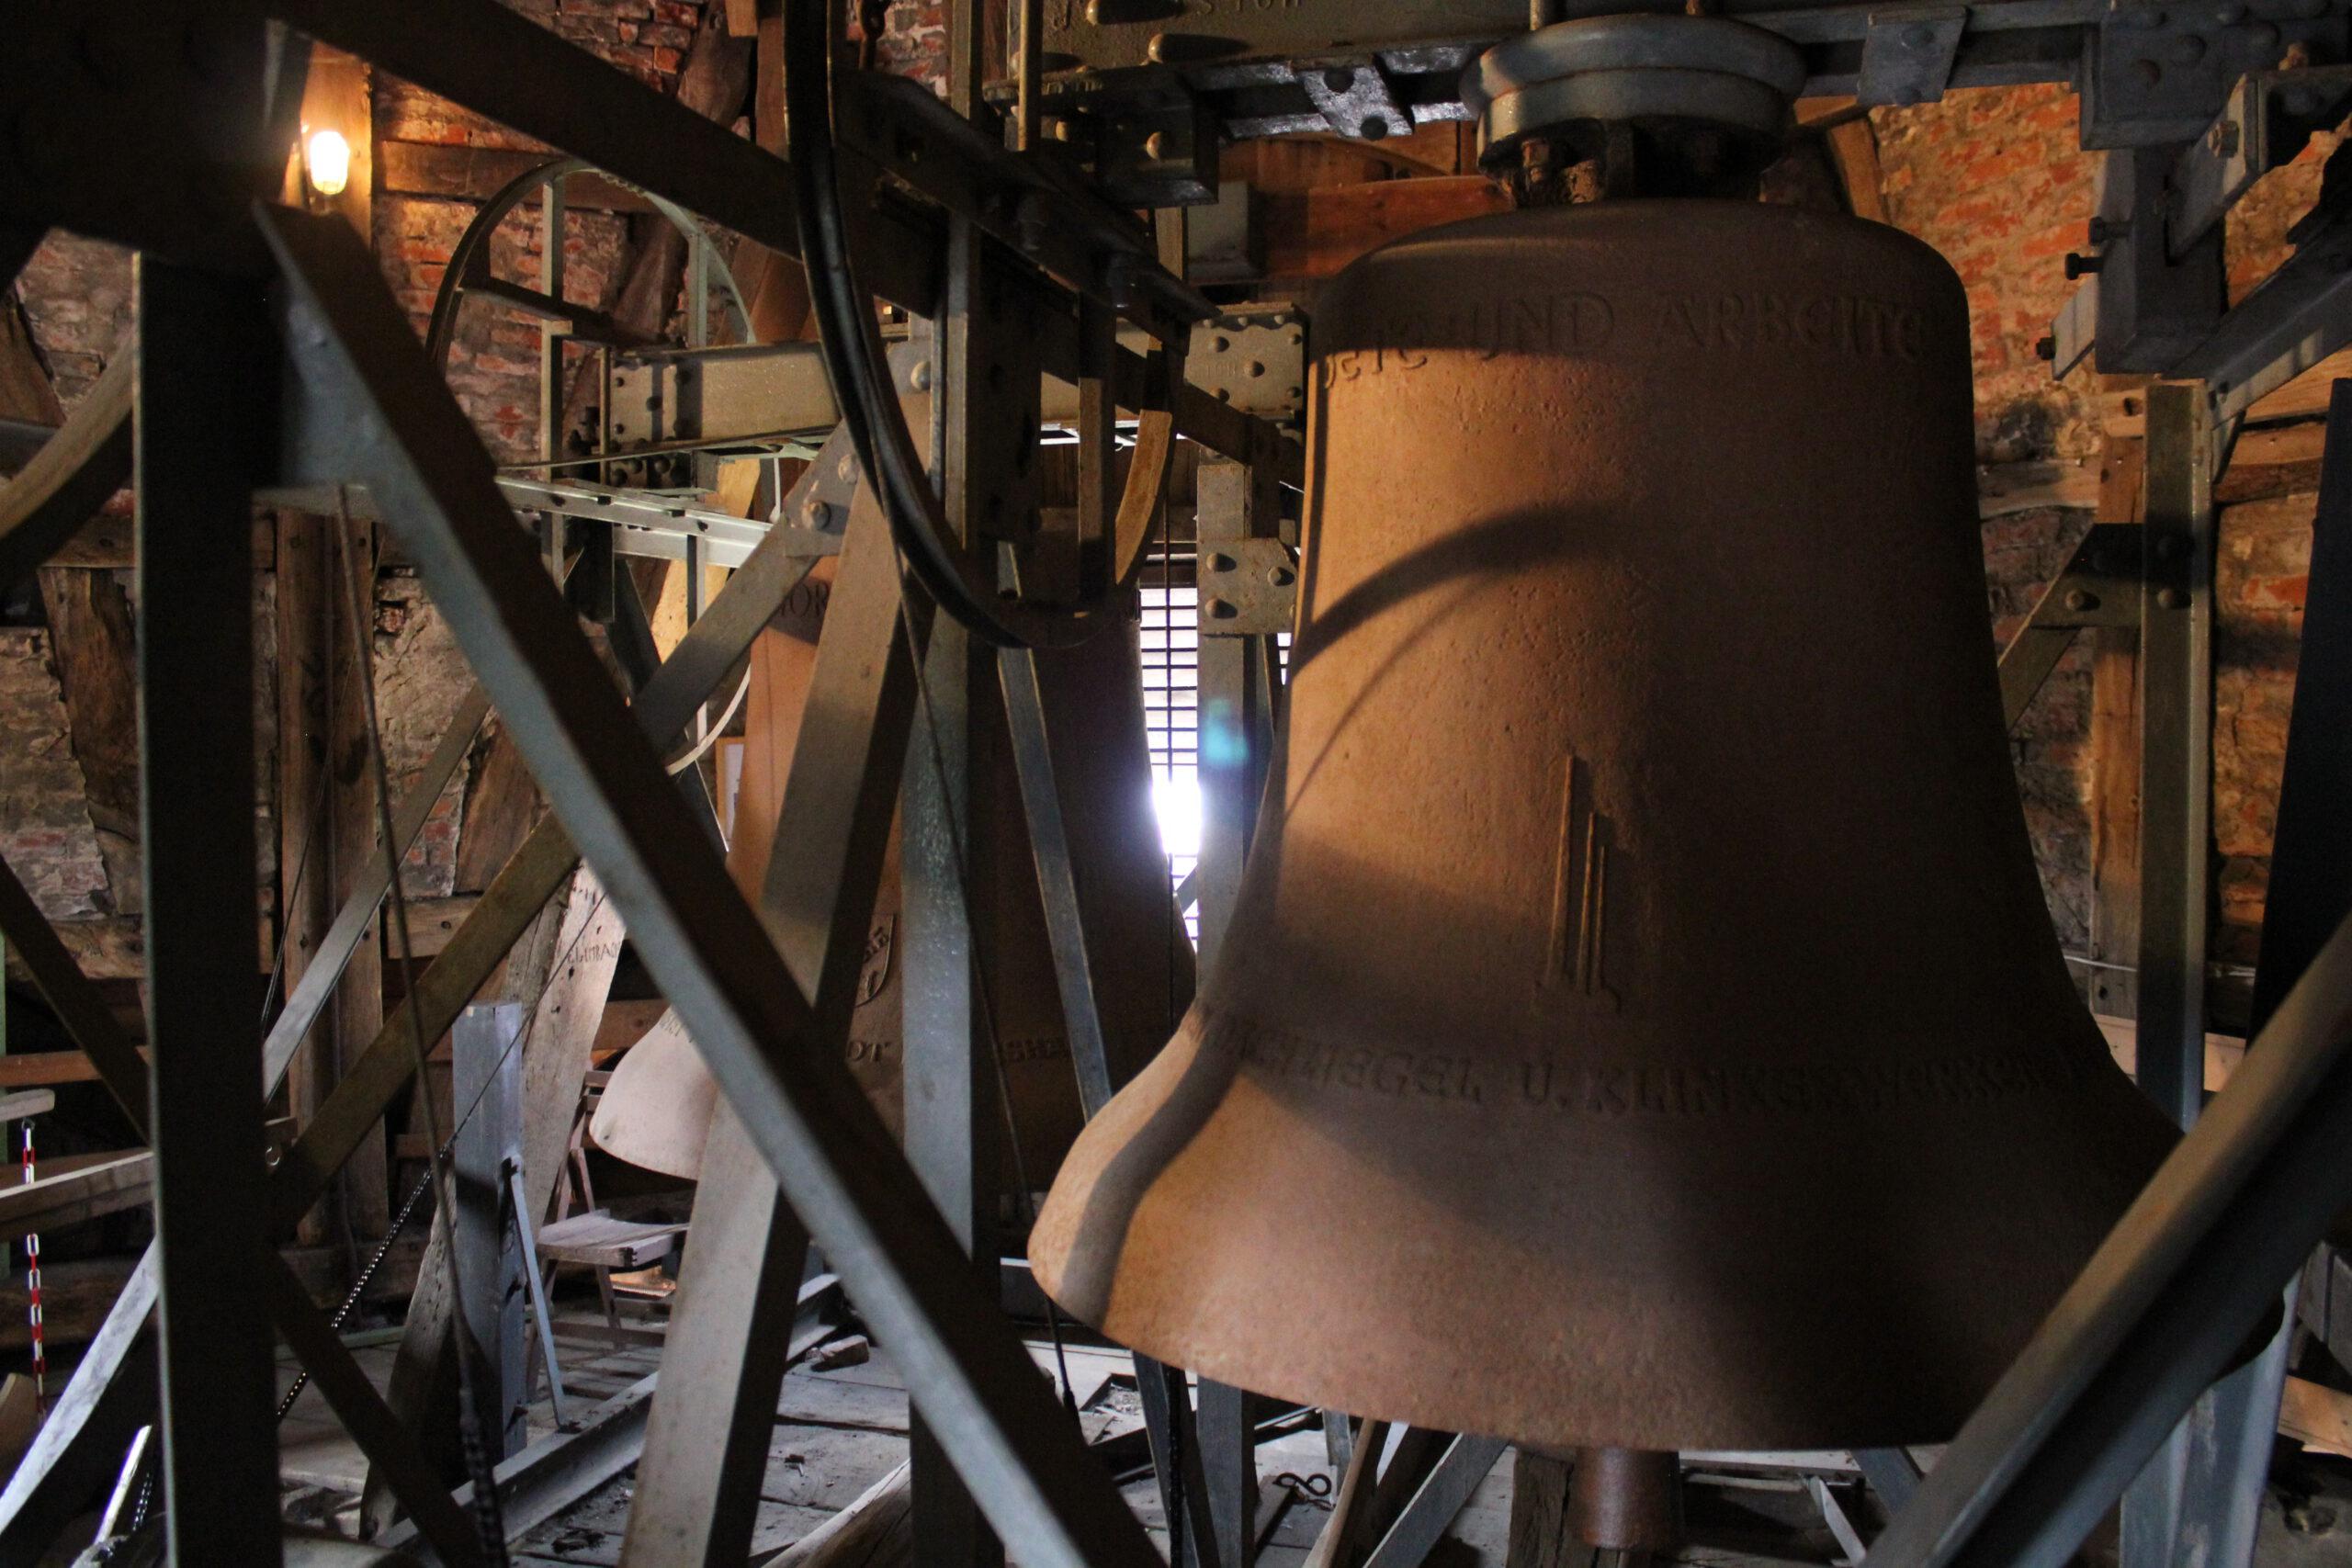 2020 | Turmmusik zu Silvester in der Petrikirche